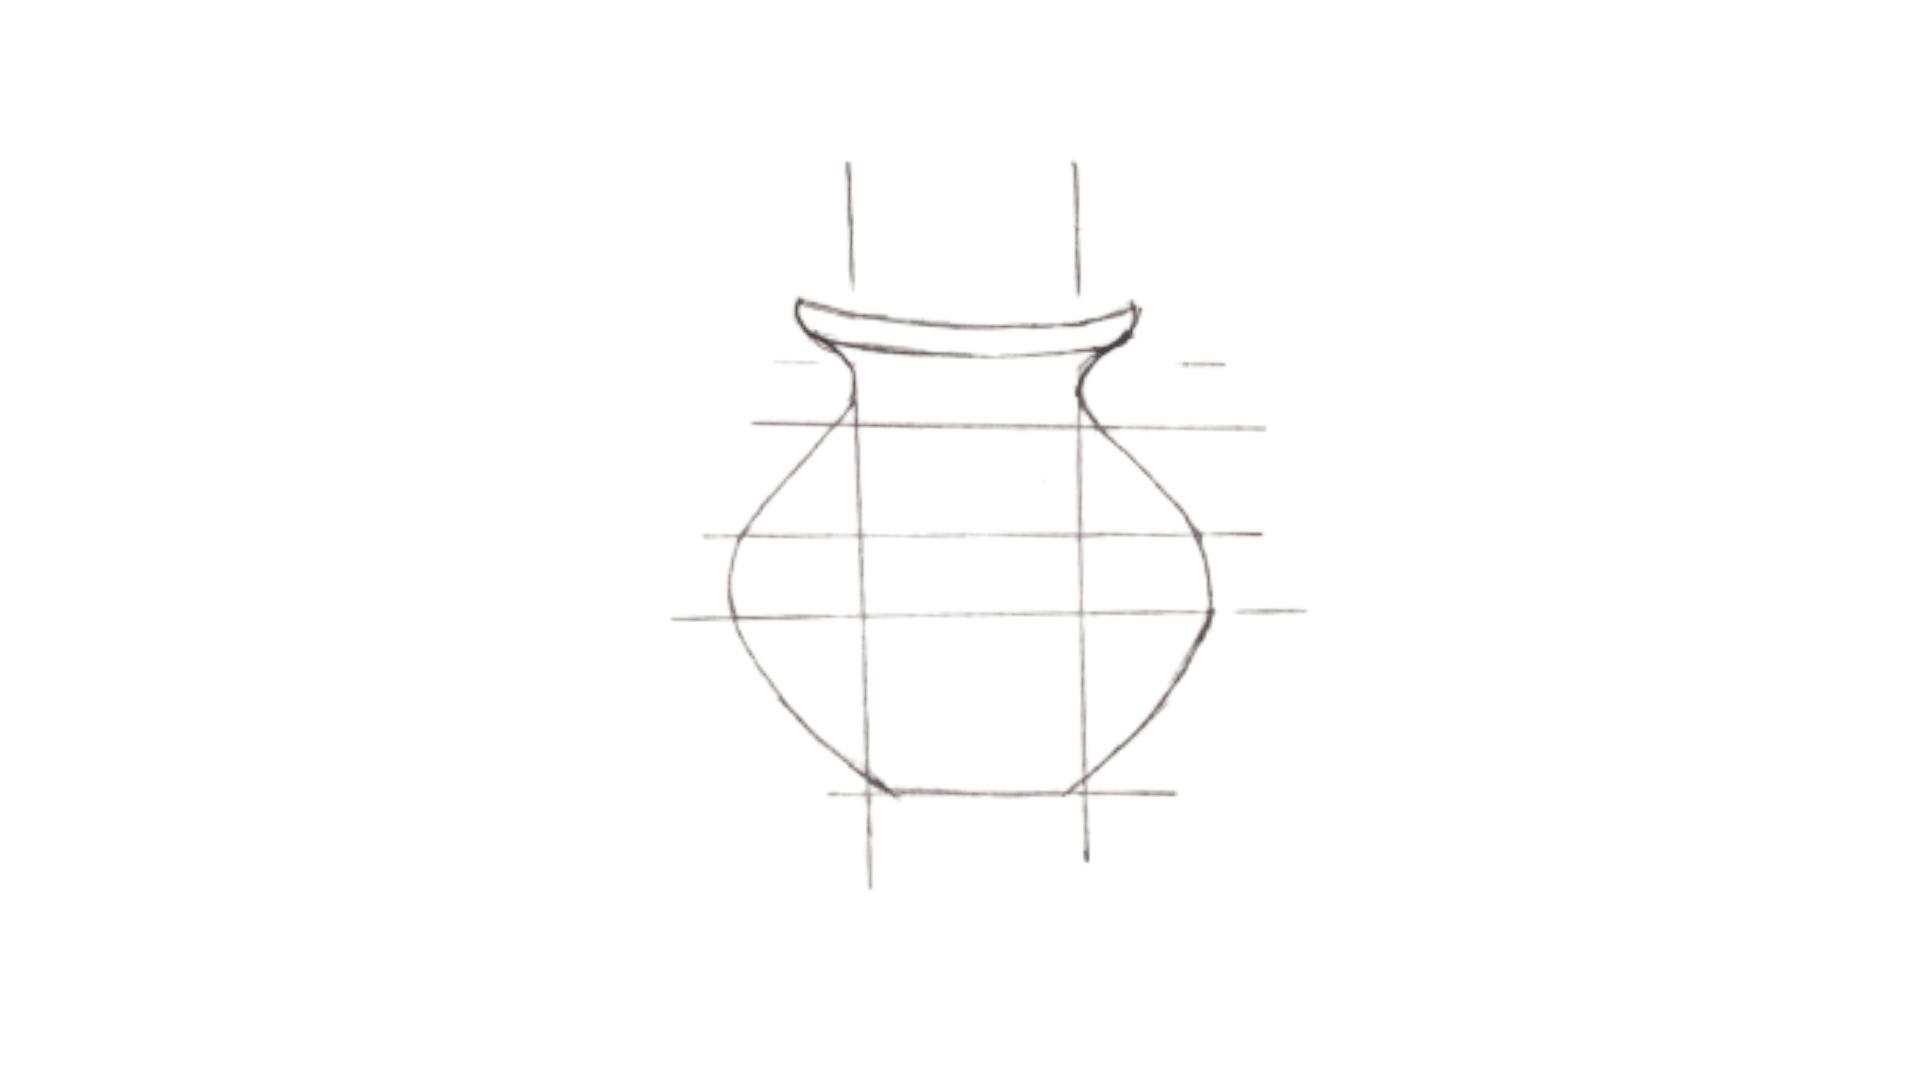 Pongal pot drawing step 3